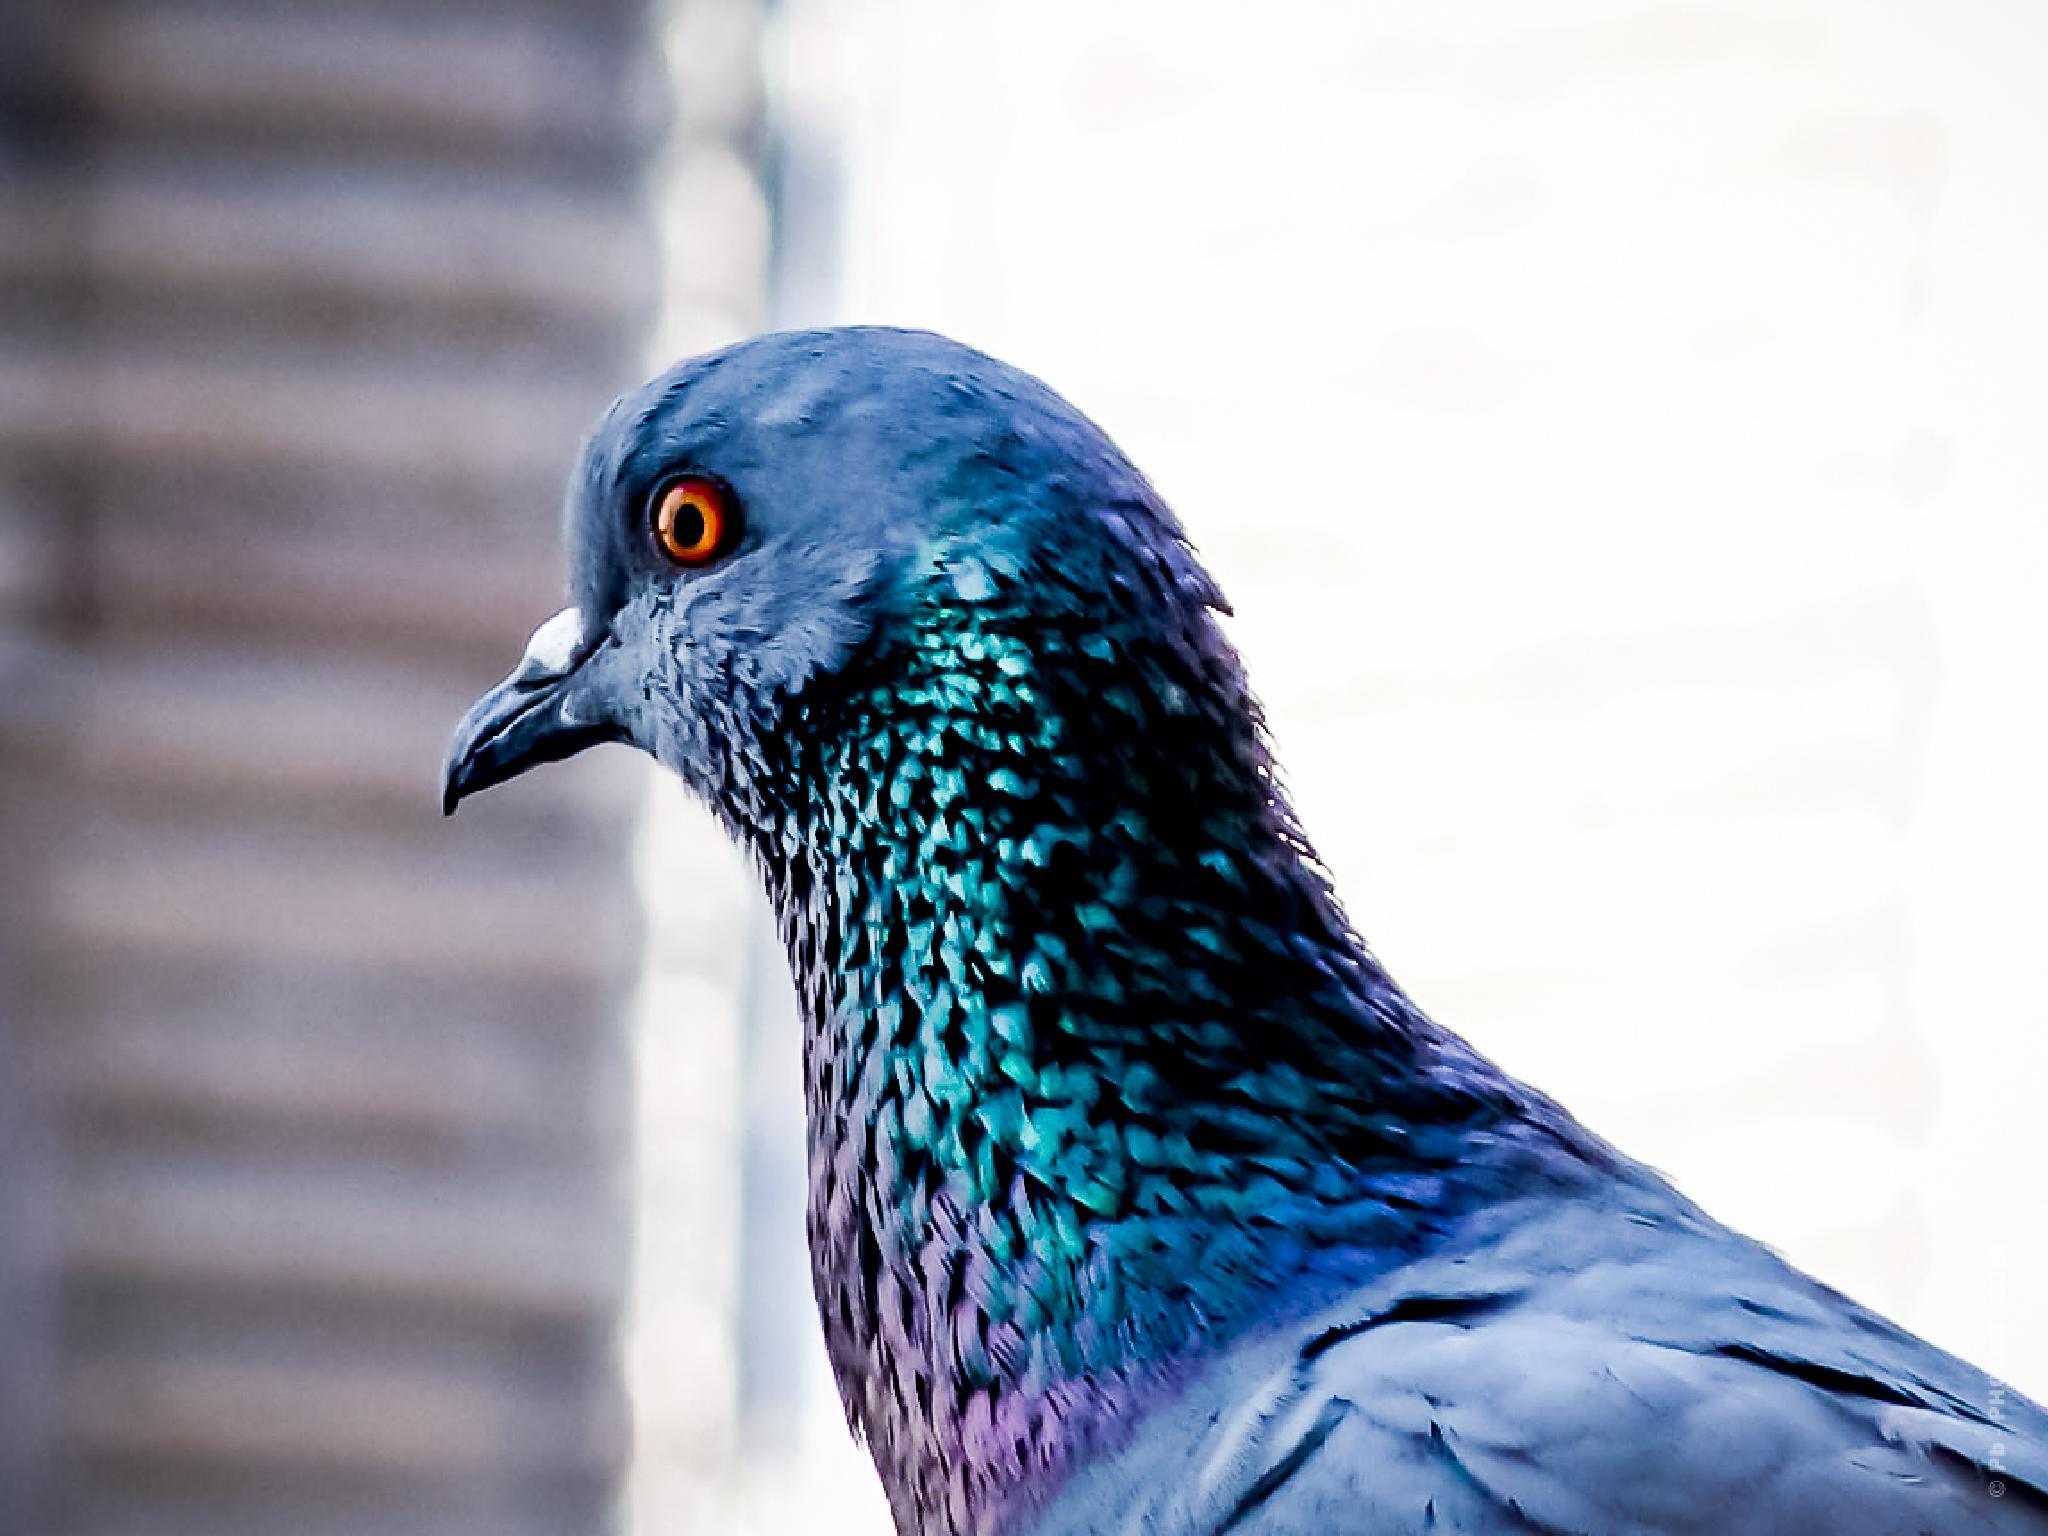 Blue Rock Pigeon  by Pb - PHOTOS